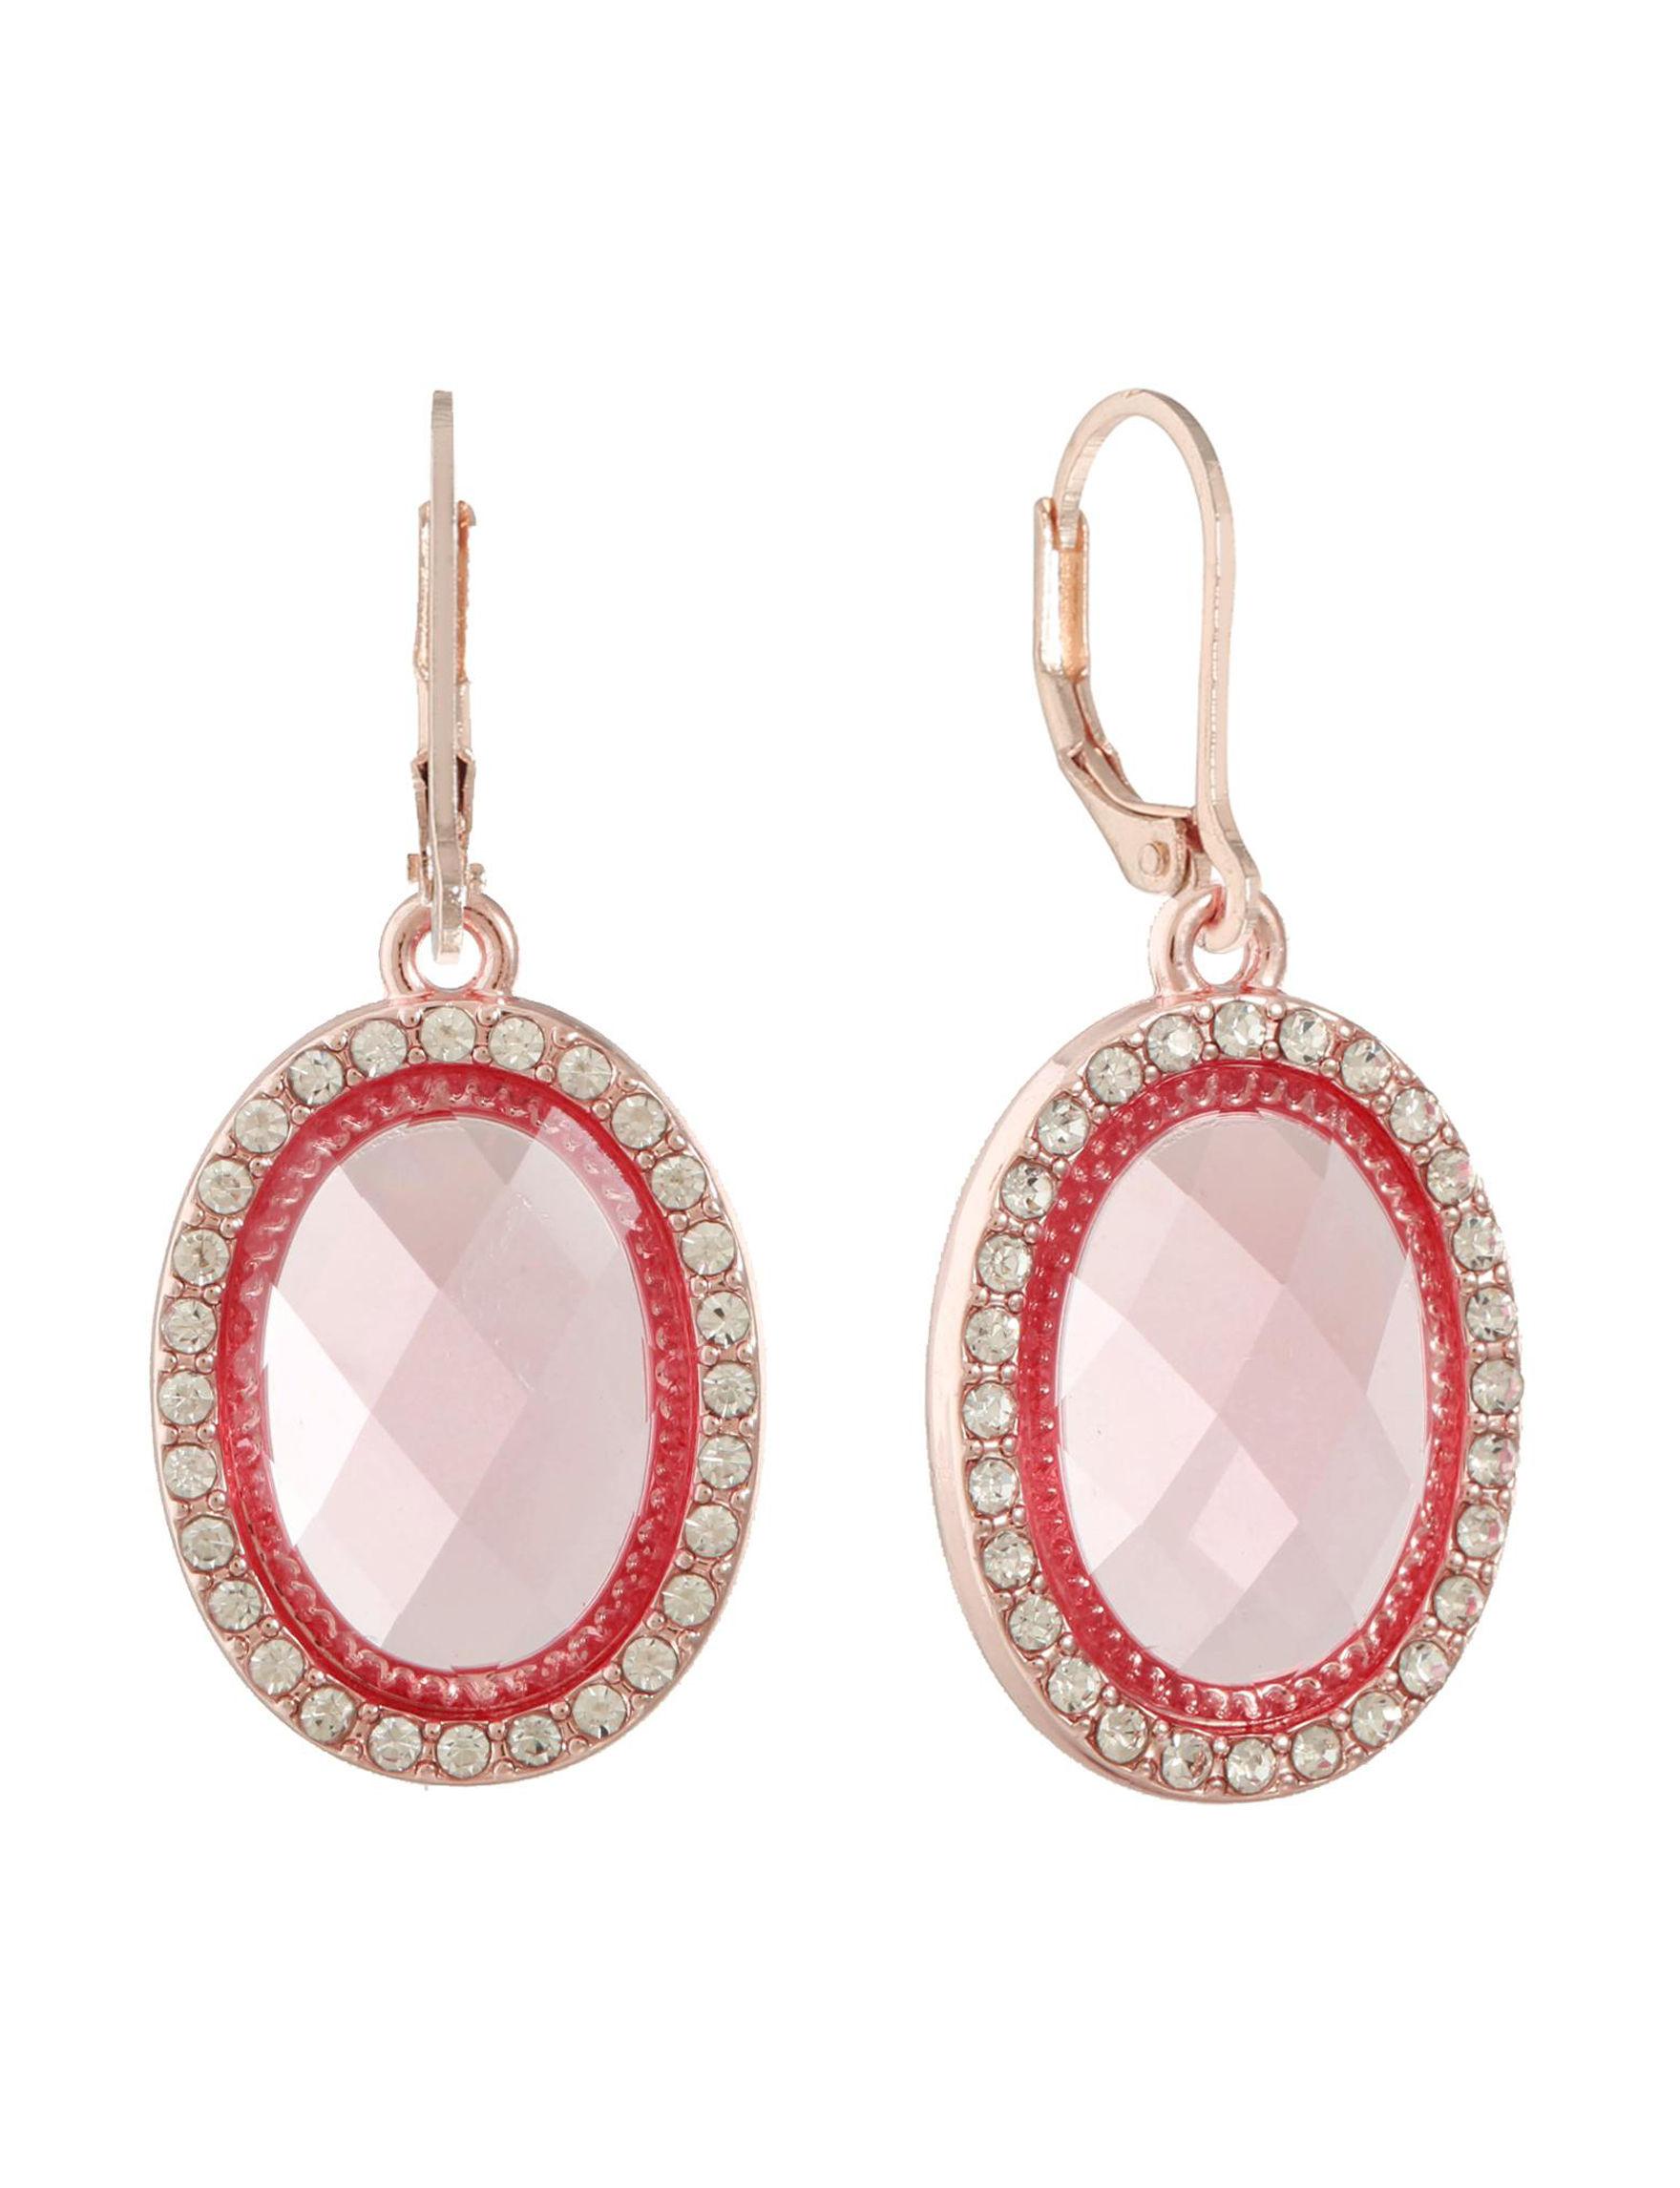 Gloria Vanderbilt Rose Gold / Pink Drops Earrings Fashion Jewelry